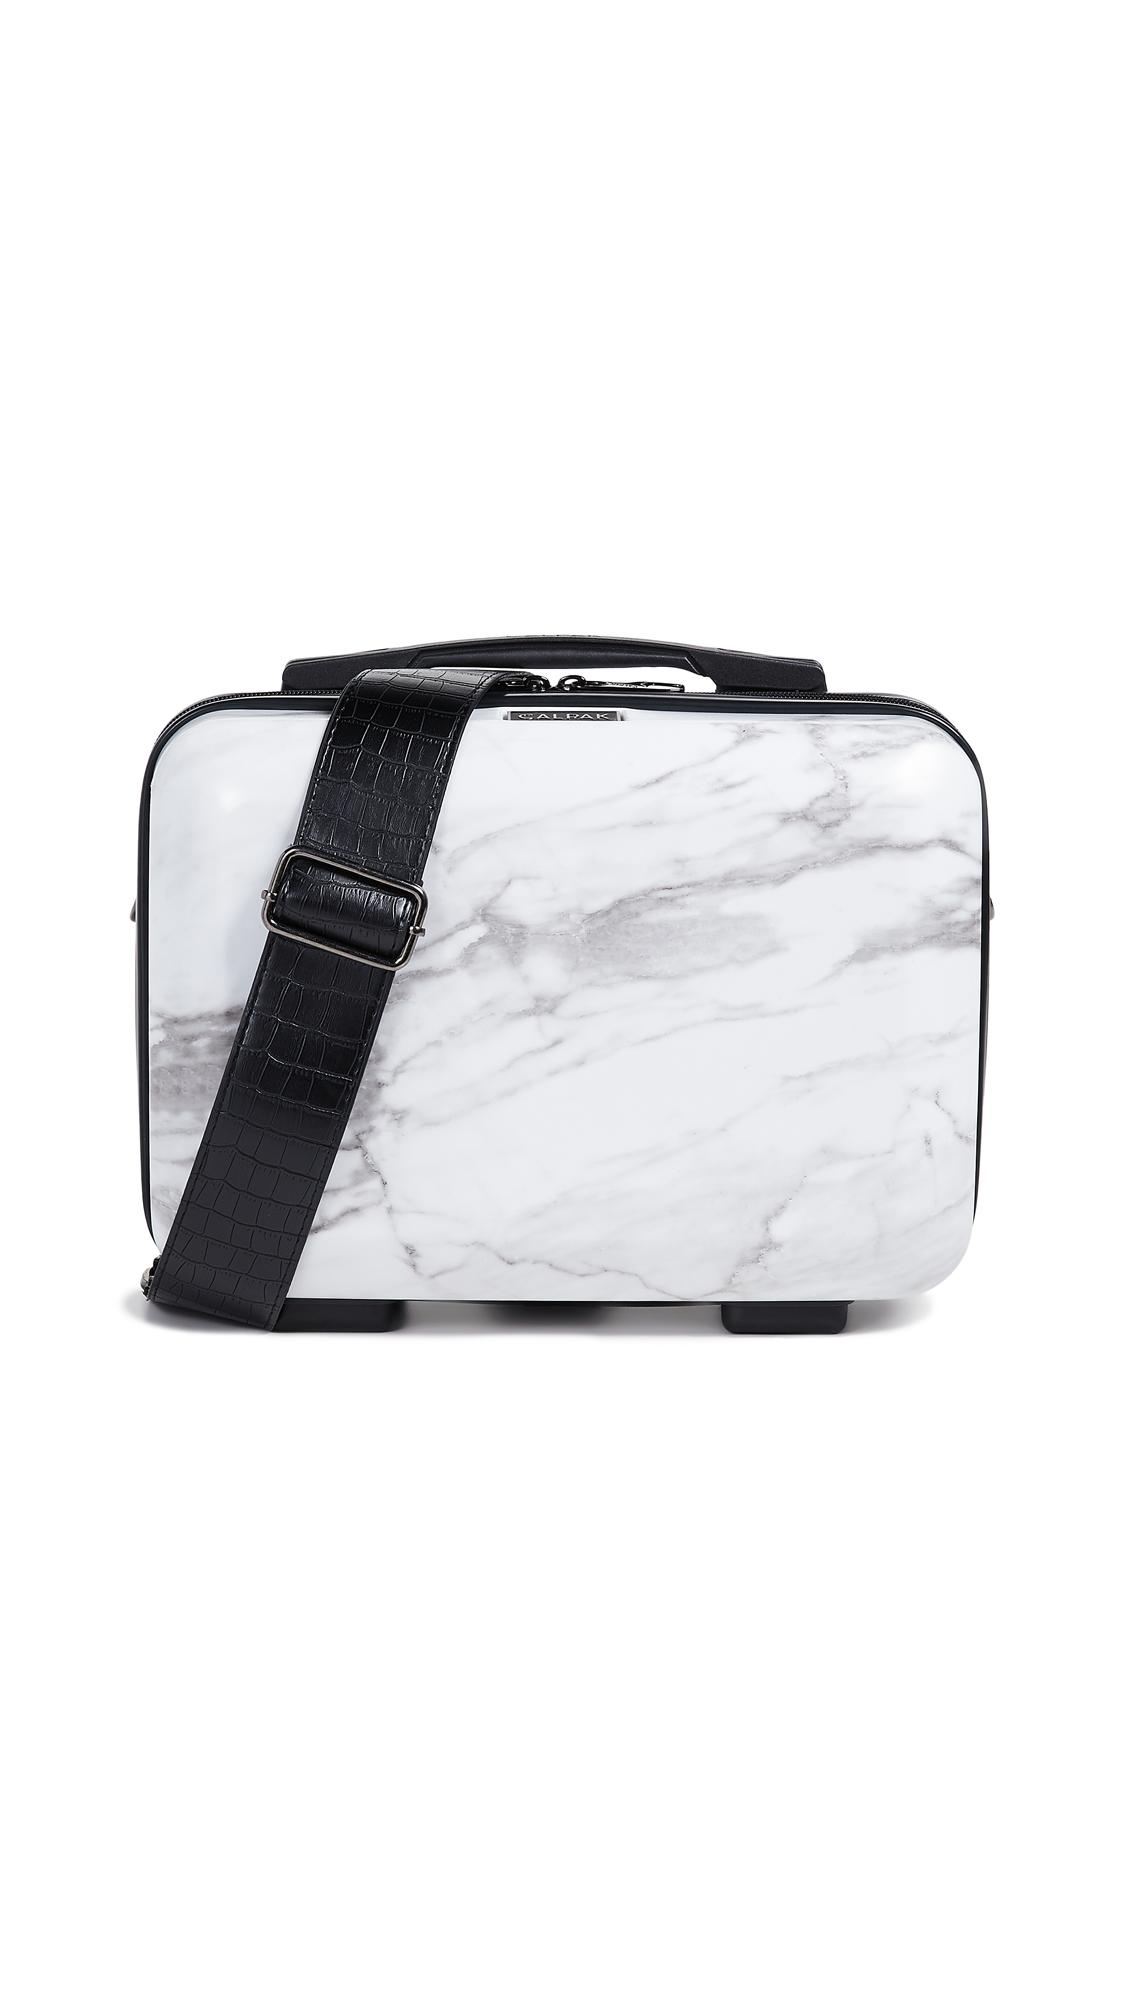 Astyll Marbled Hardshell Vanity Suitcase, Milk Marble